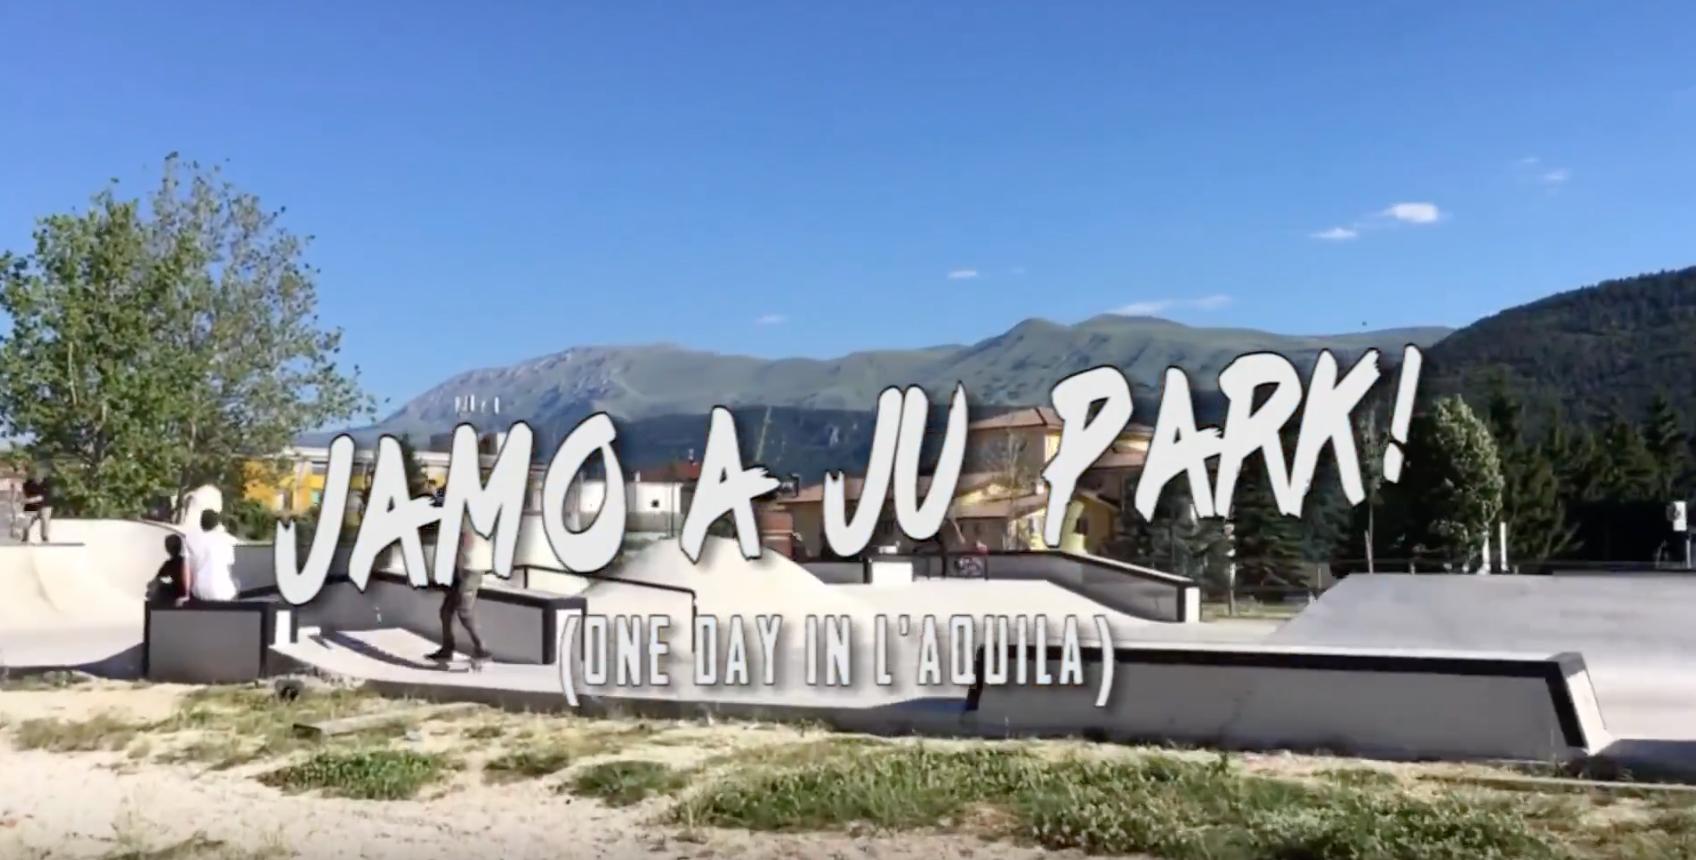 Kahuna - Jamo a Ju Park (One Day in L'Aquila)